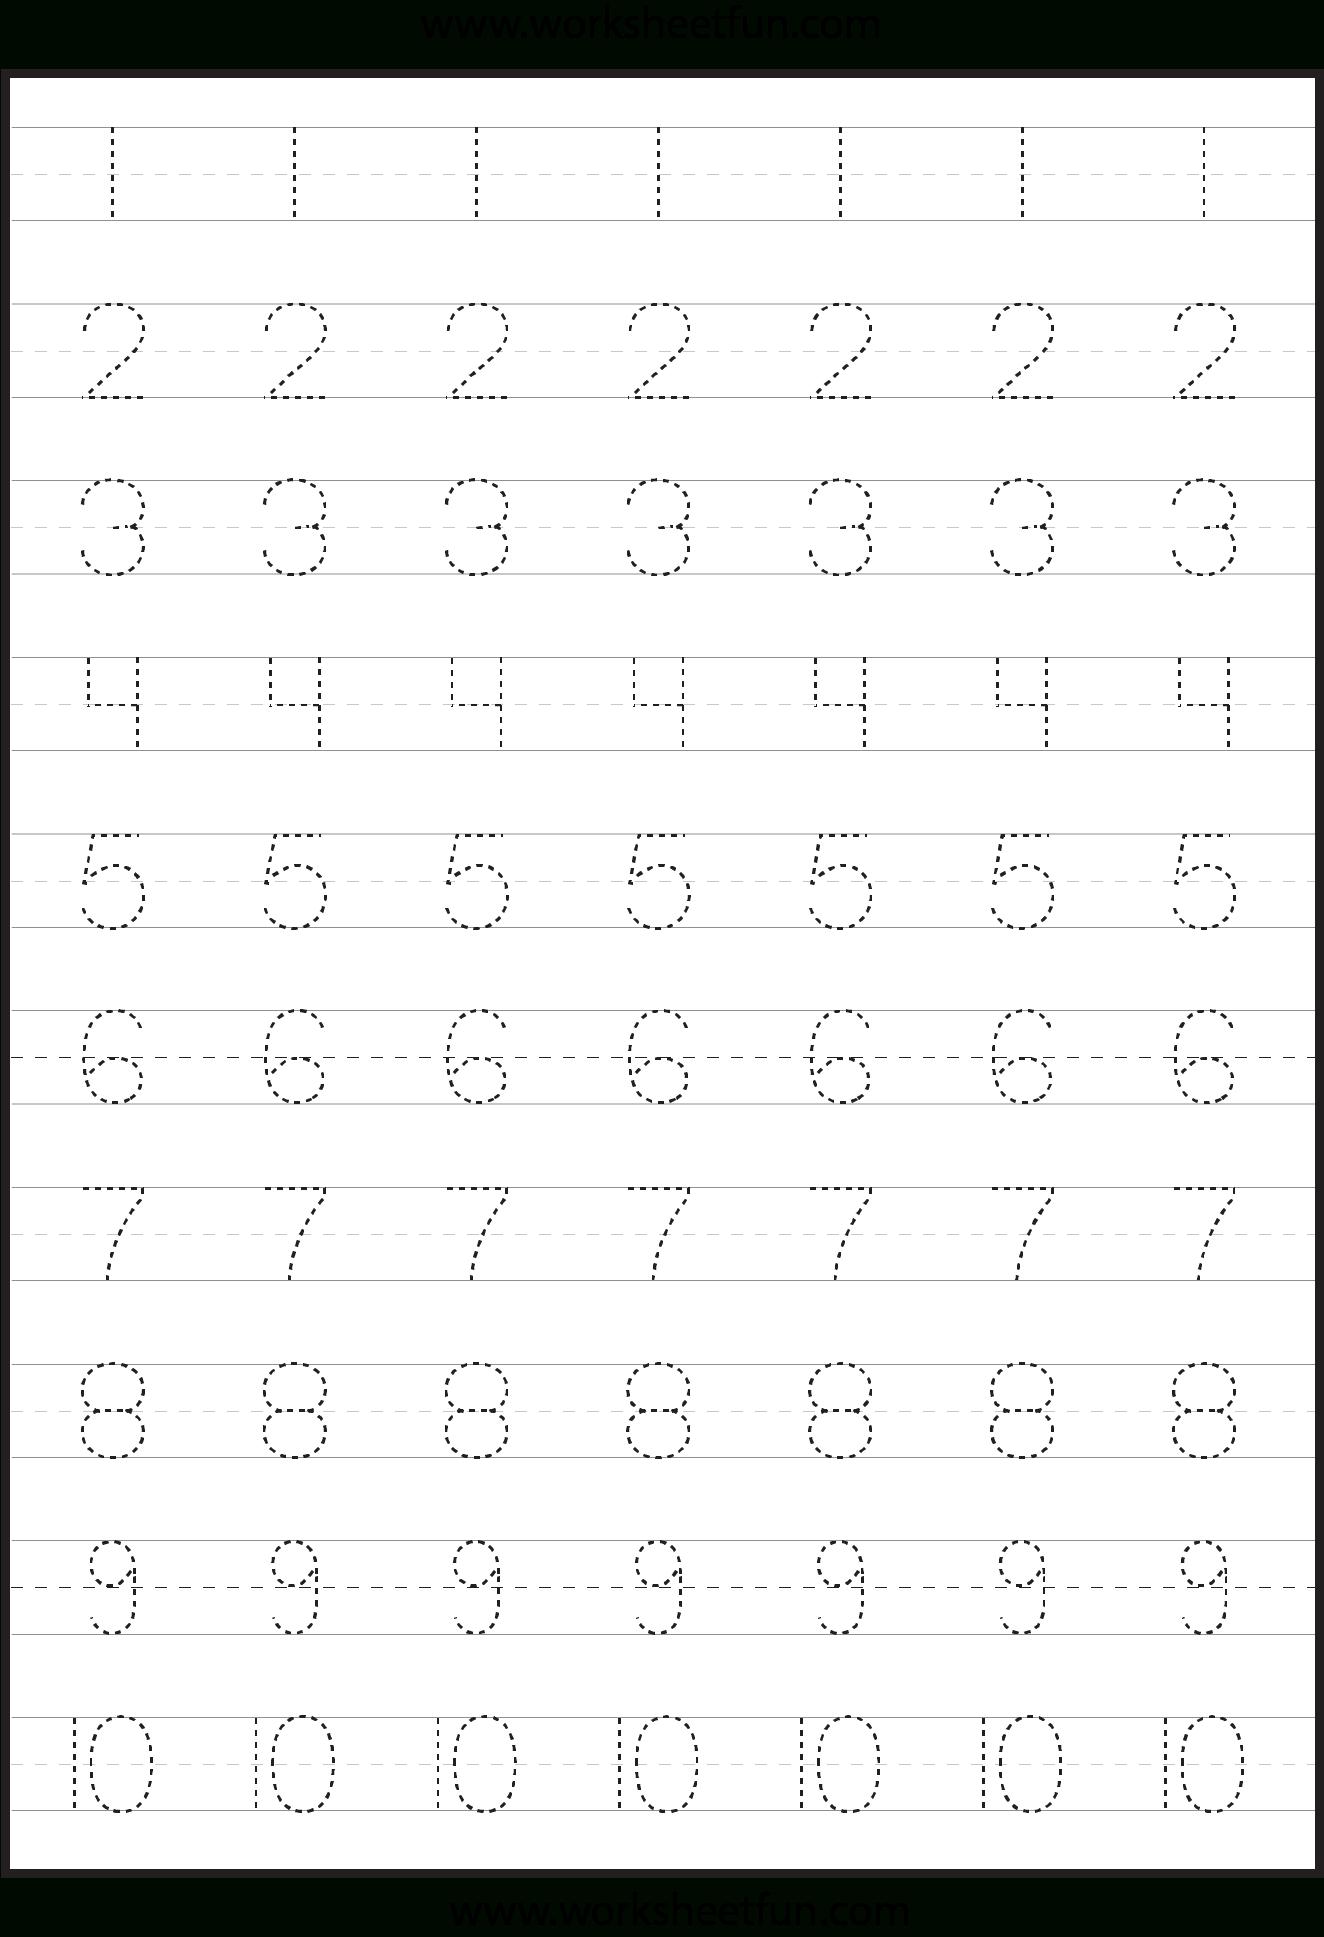 Number Tracing Worksheets For Kindergarten- 1-10 – Ten regarding Alphabet Tracing Worksheets 1-10 Pdf